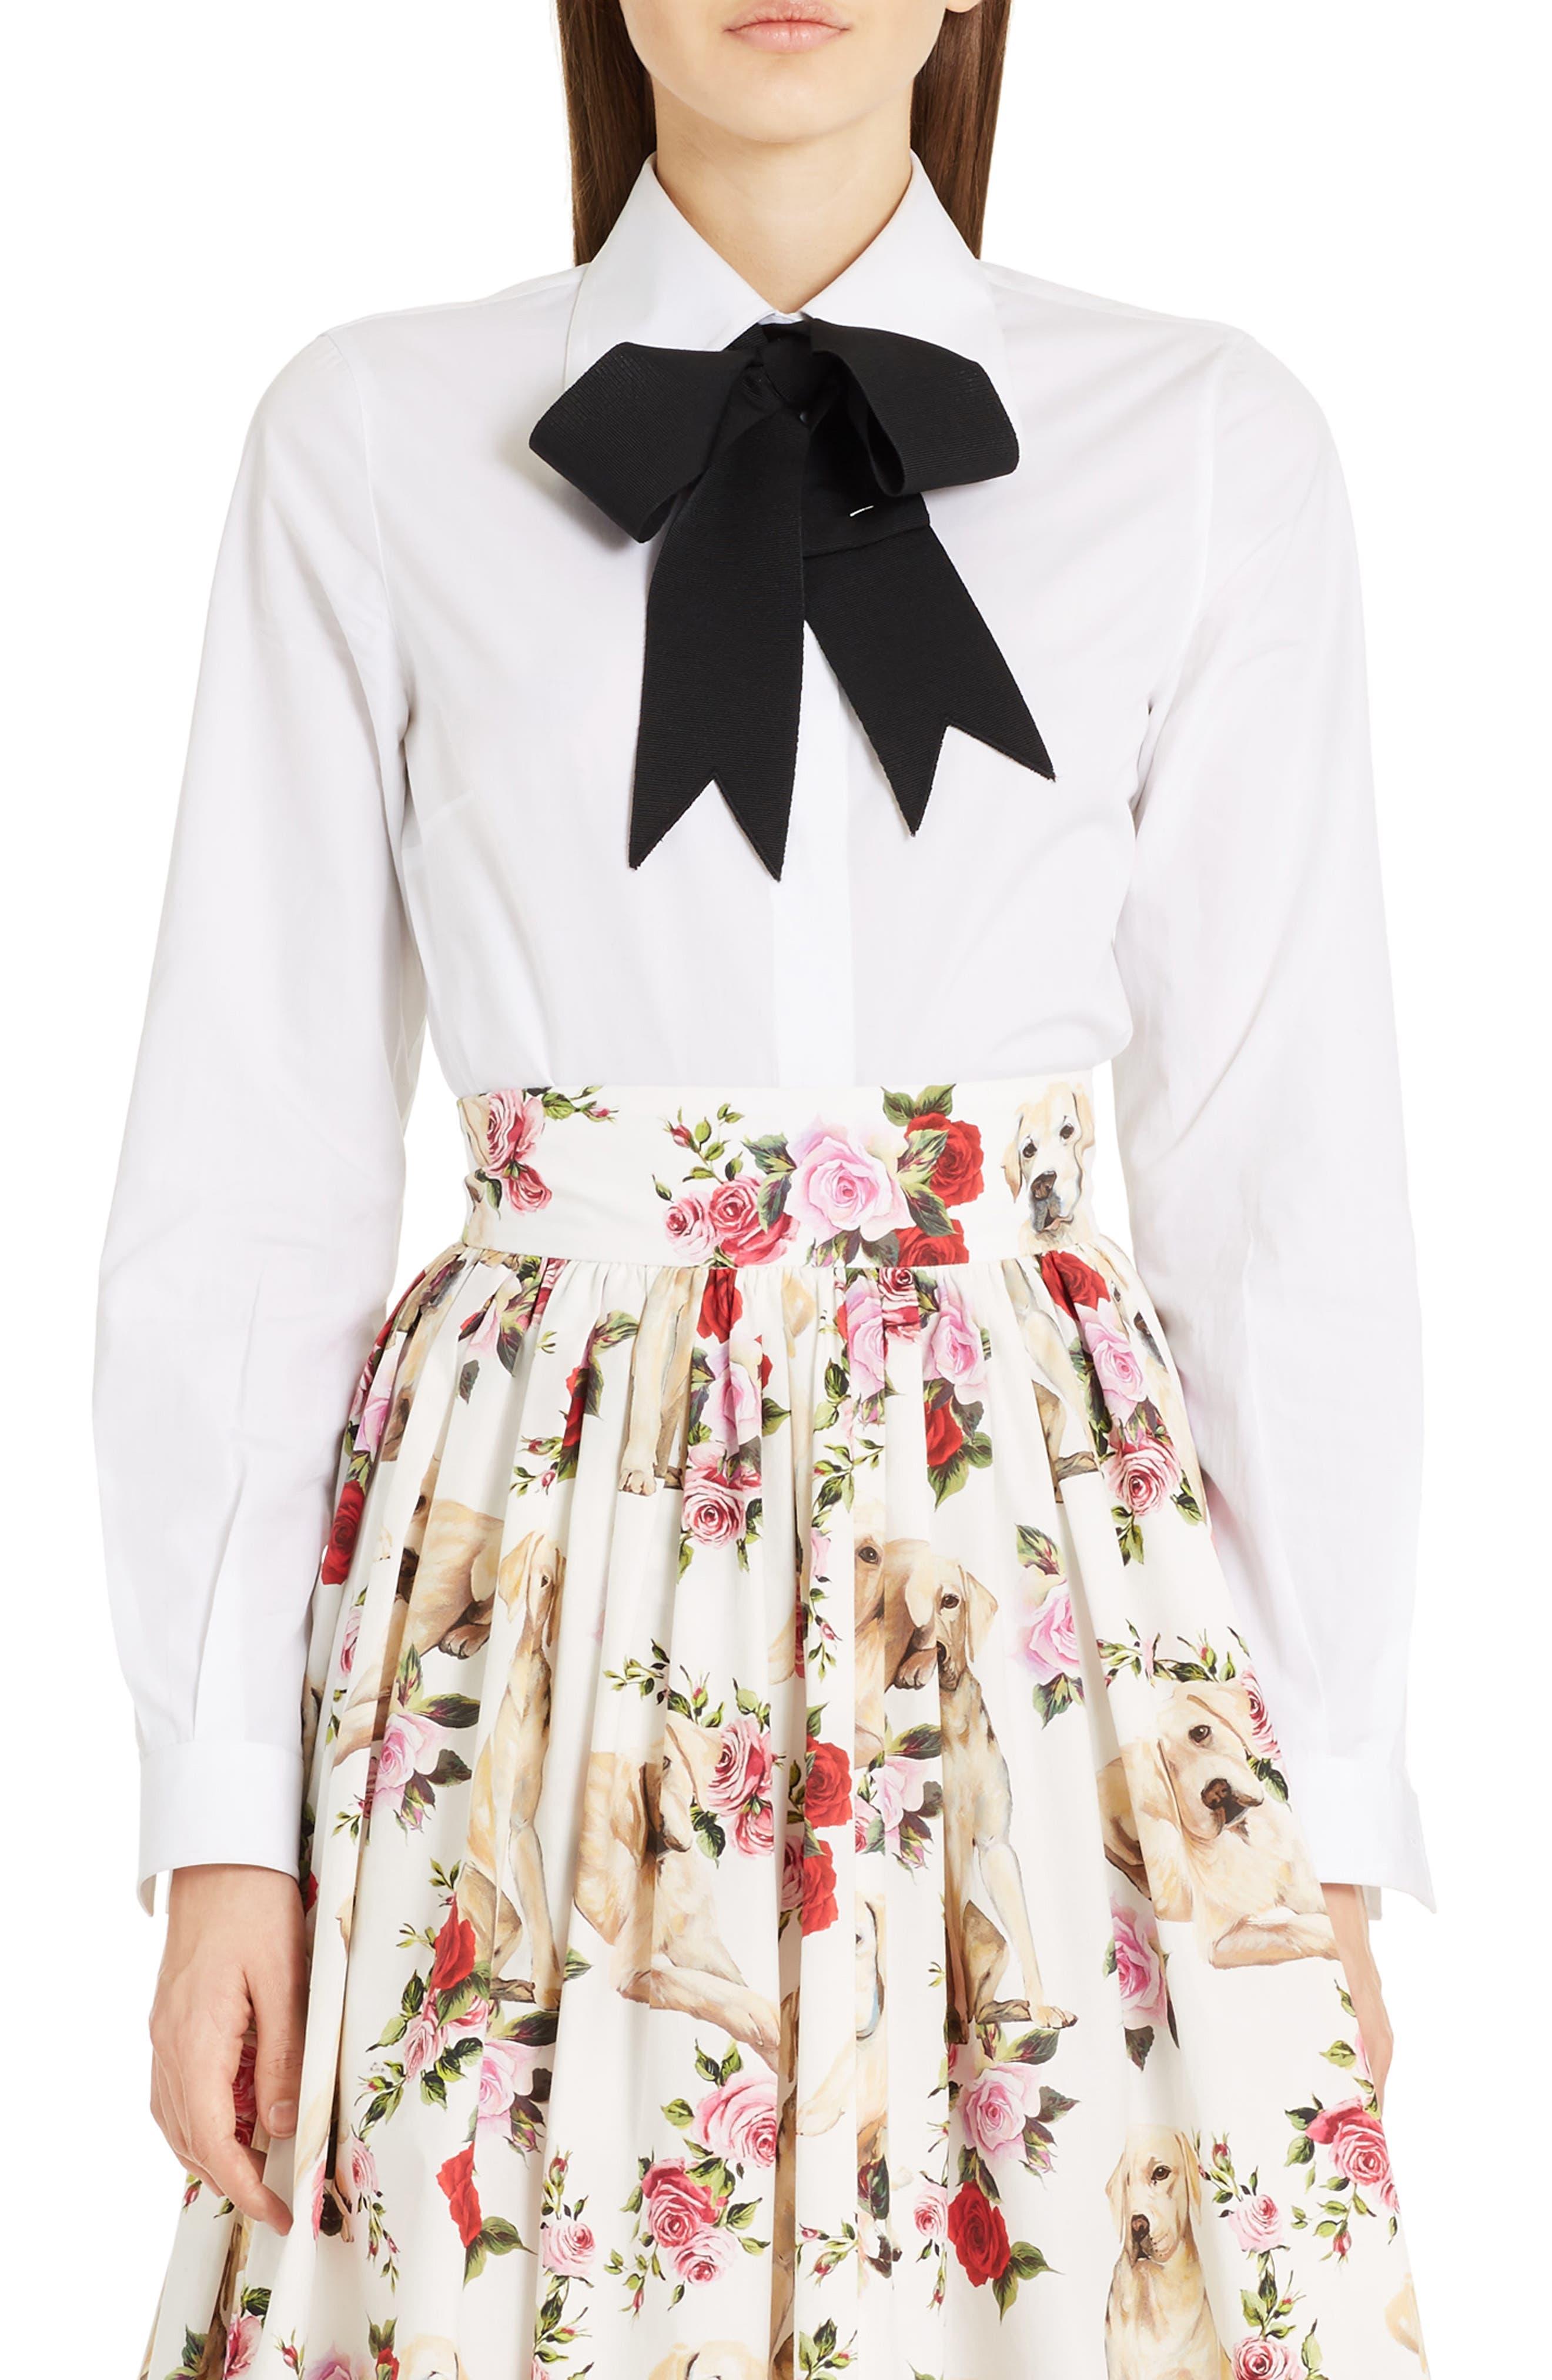 Dolce&Gabbana Cotton Poplin Blouse with Bow